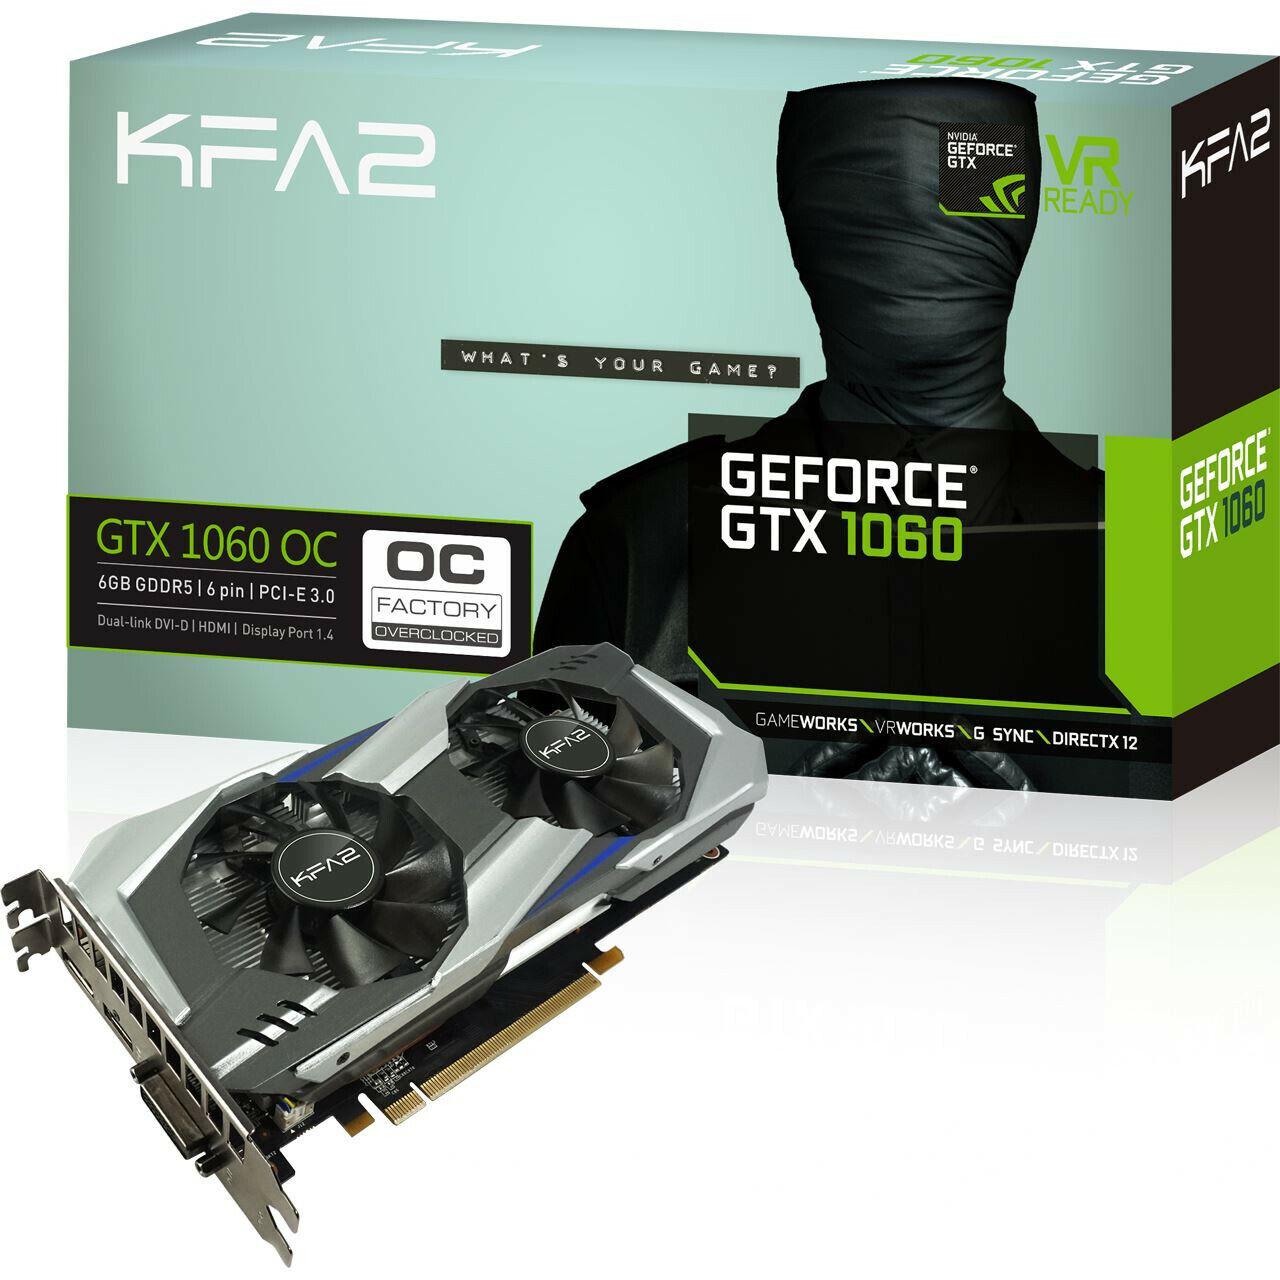 KFA2 Geforce GTX 1060 OC 6GB Grafikkarte *wie neu* (kein OC/mining)